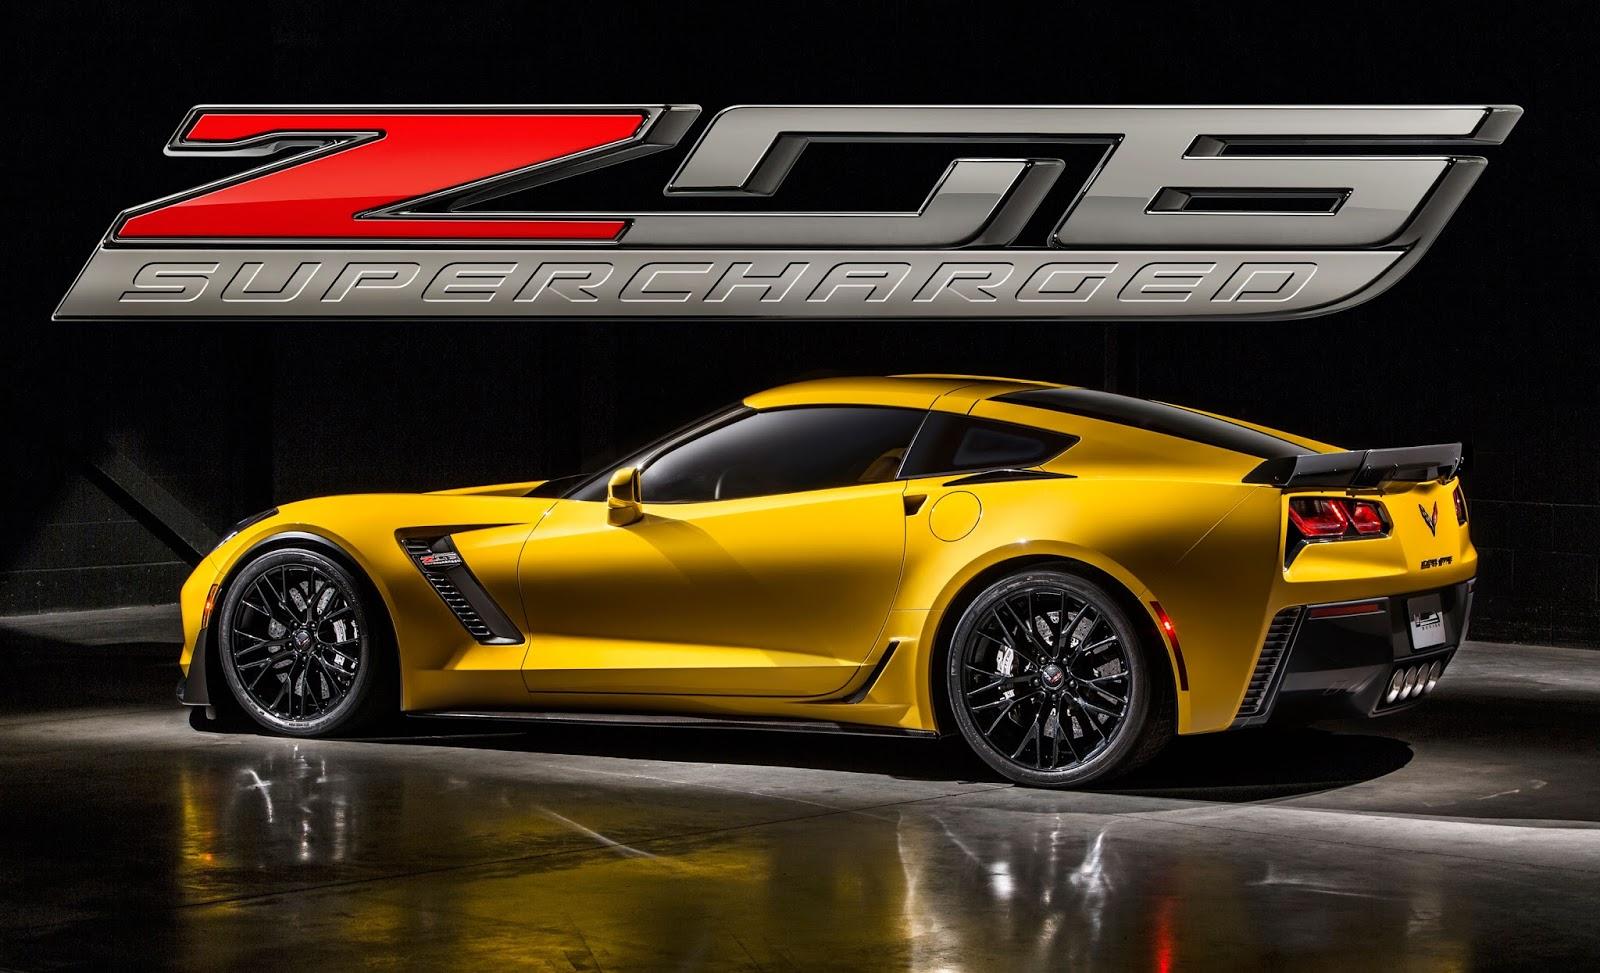 2014 Corvette Price and Options Guide | Kerbeck Corvette